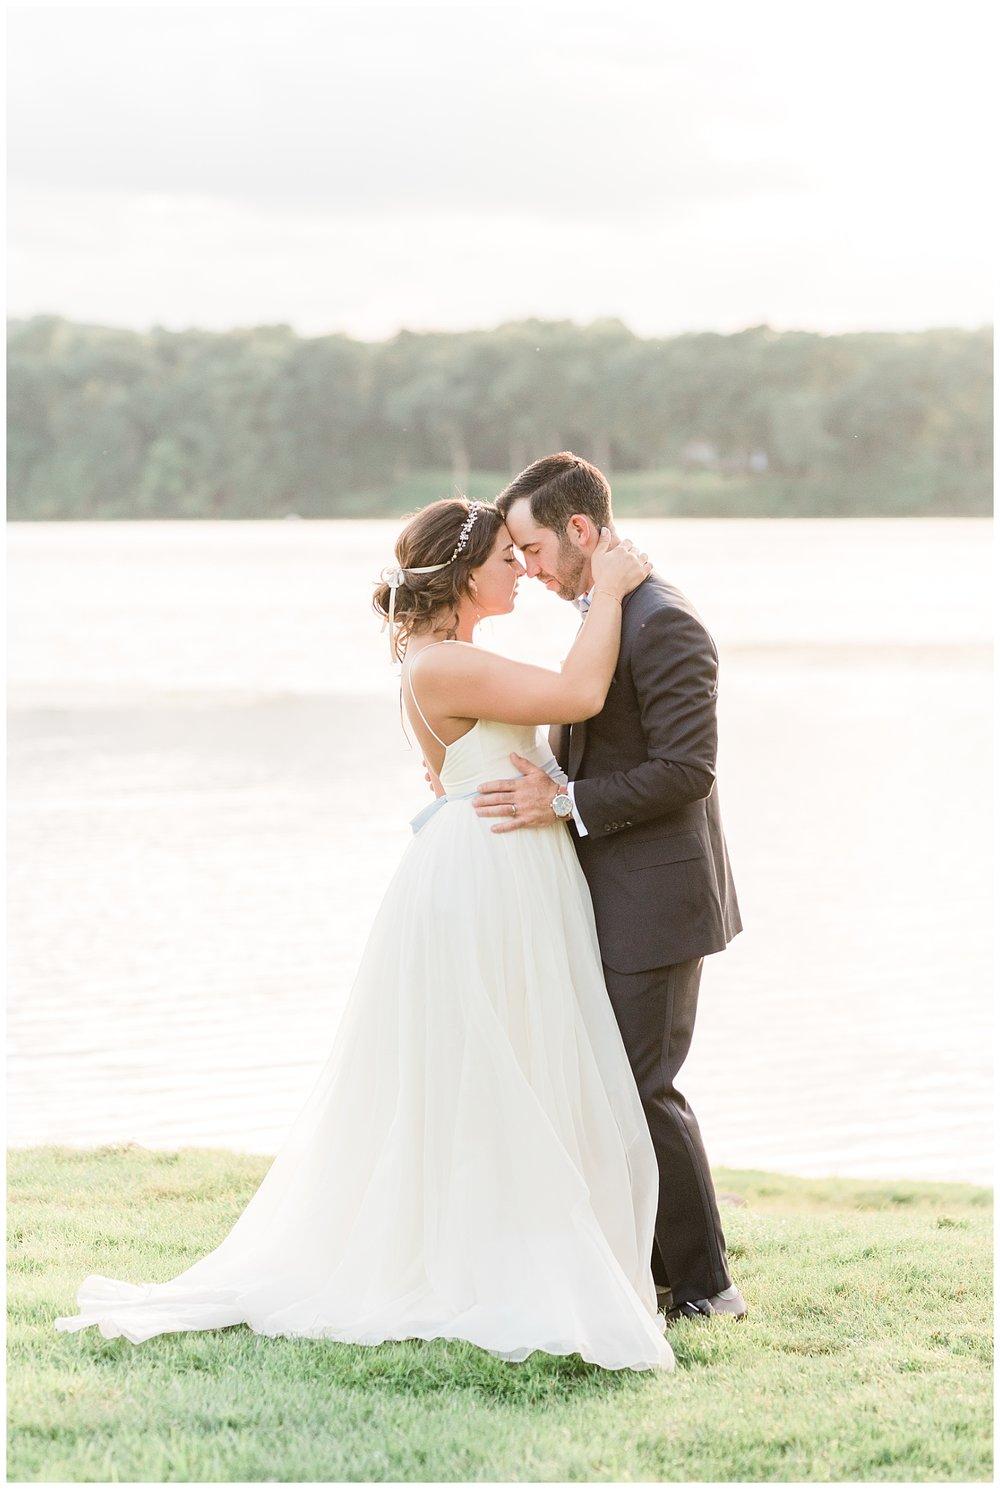 Indian-Trail-Club-Franklin-Lakes-NJ-Summer-Stylish-Wedding-Photographer-Photo-_0183.jpg